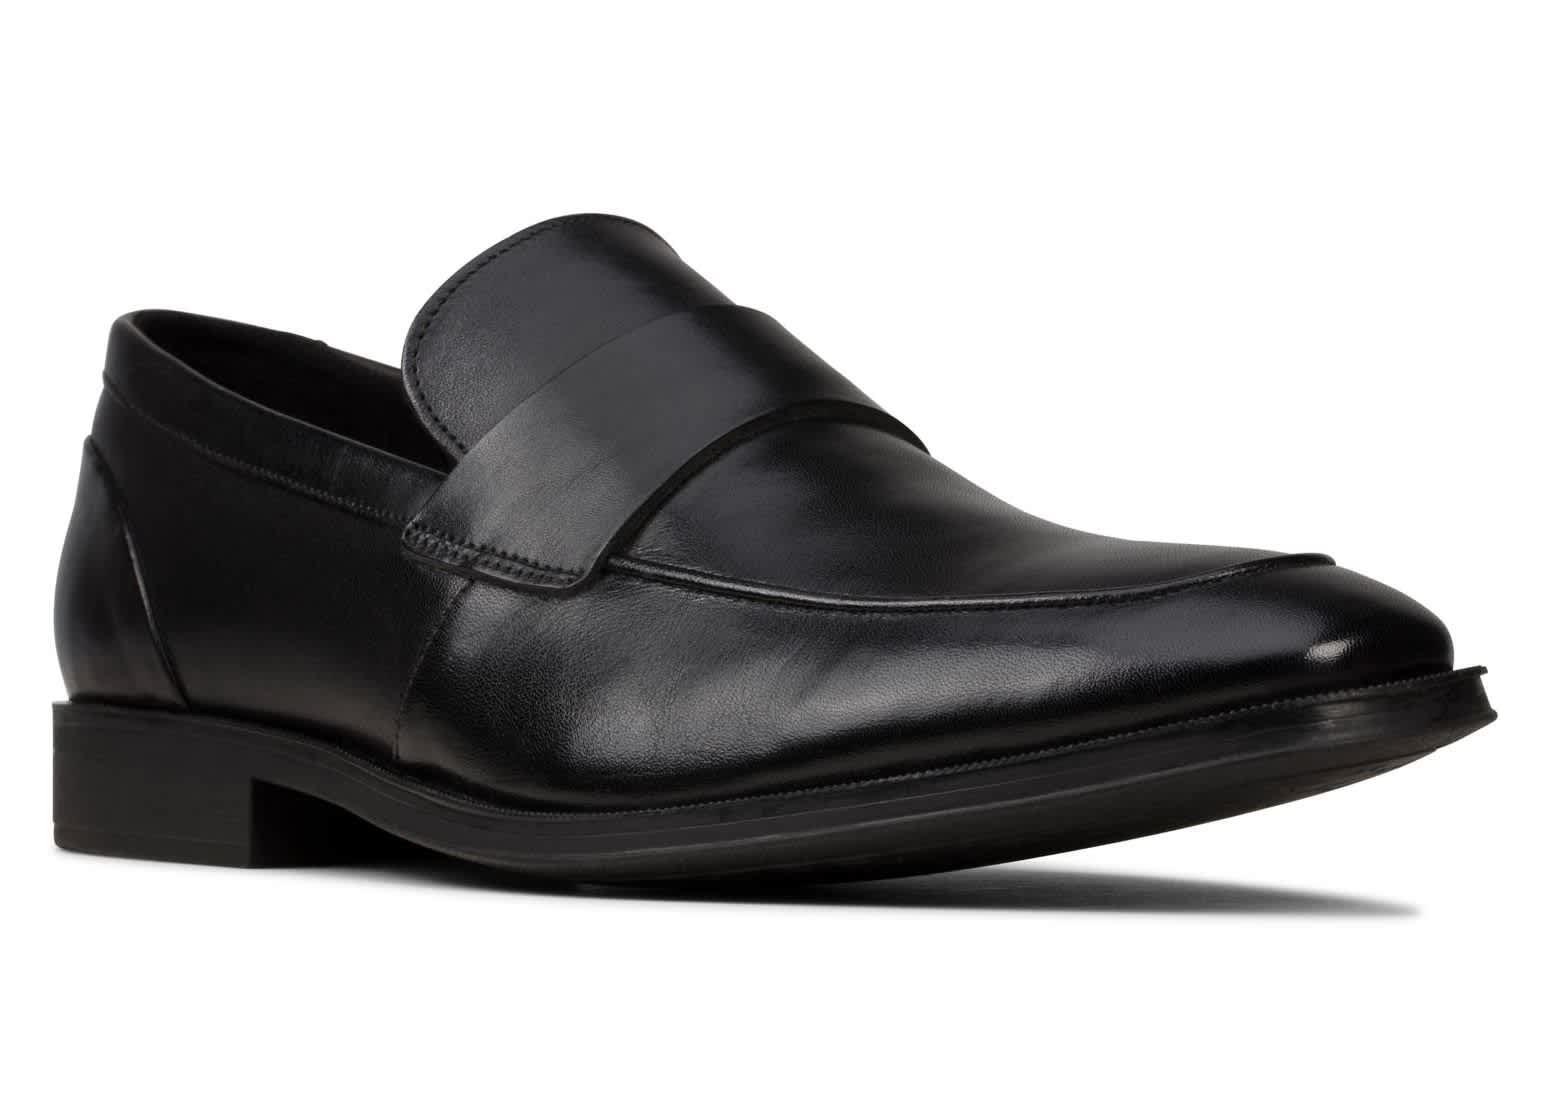 Clarks Men's Gilman Free Leather Dress Shoes